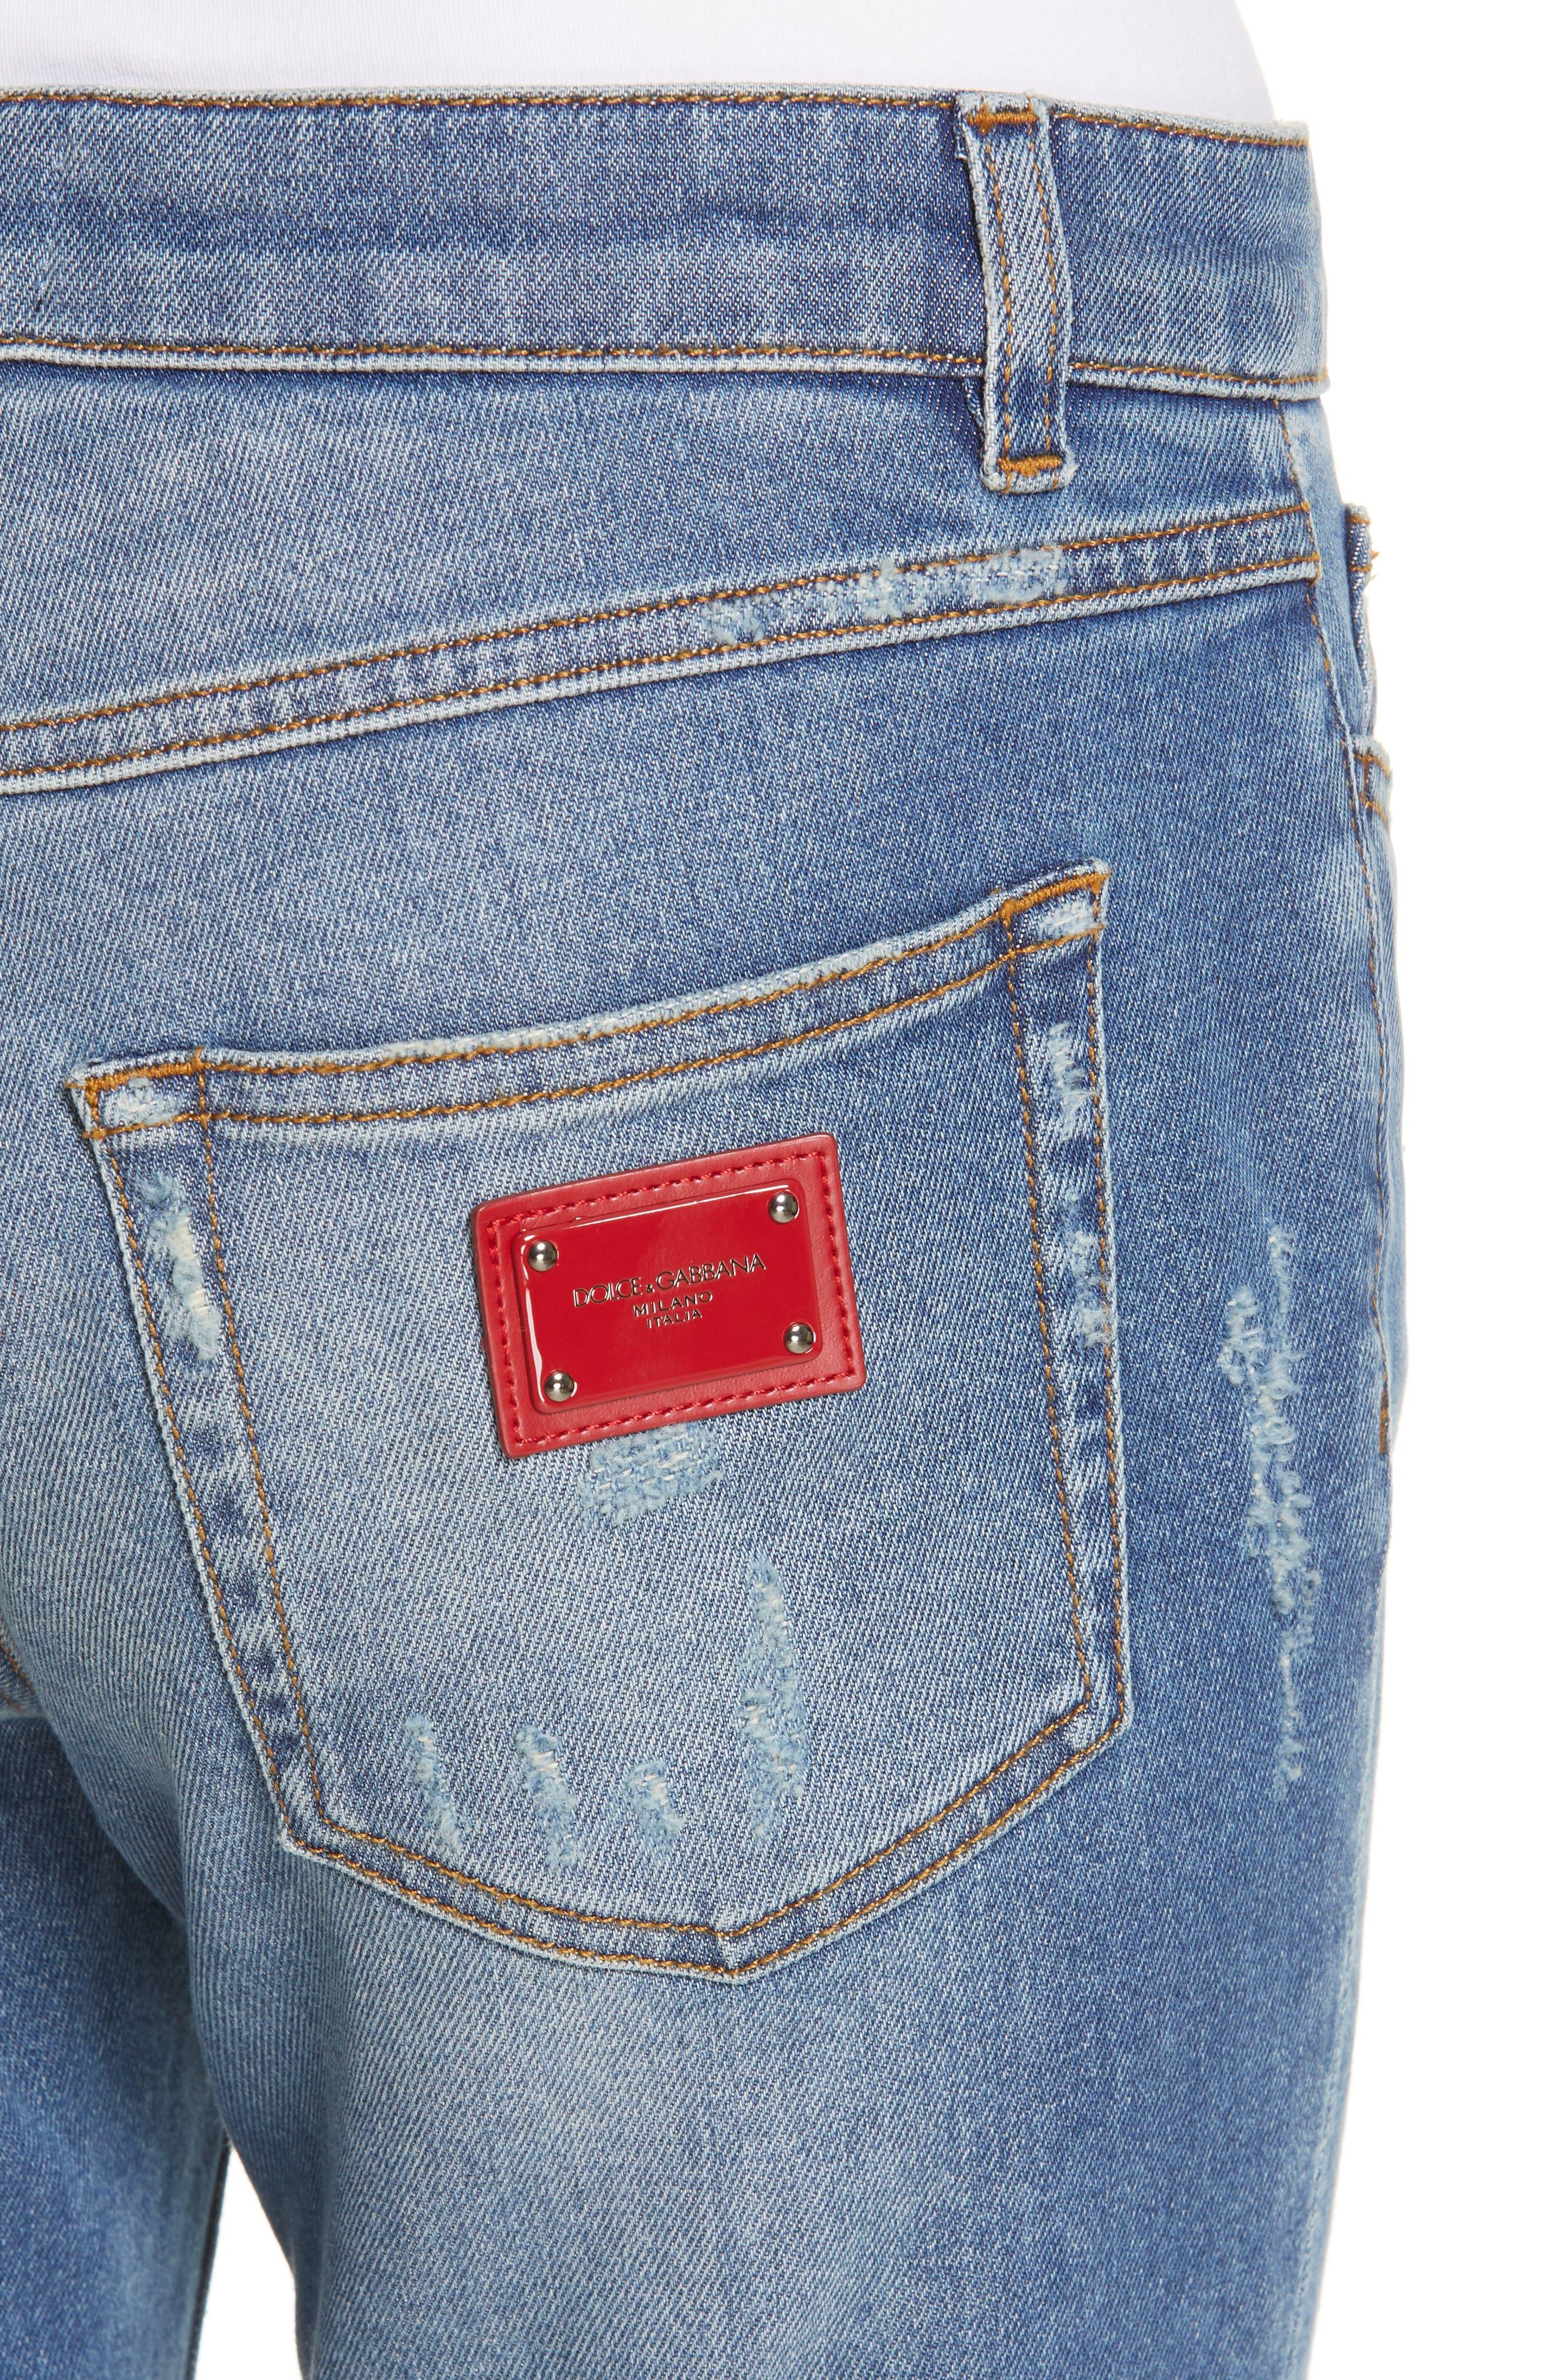 DOLCE&GABBANA, Logo Plaque Skinny Jeans, Alternate thumbnail 4, color, MED BLUE